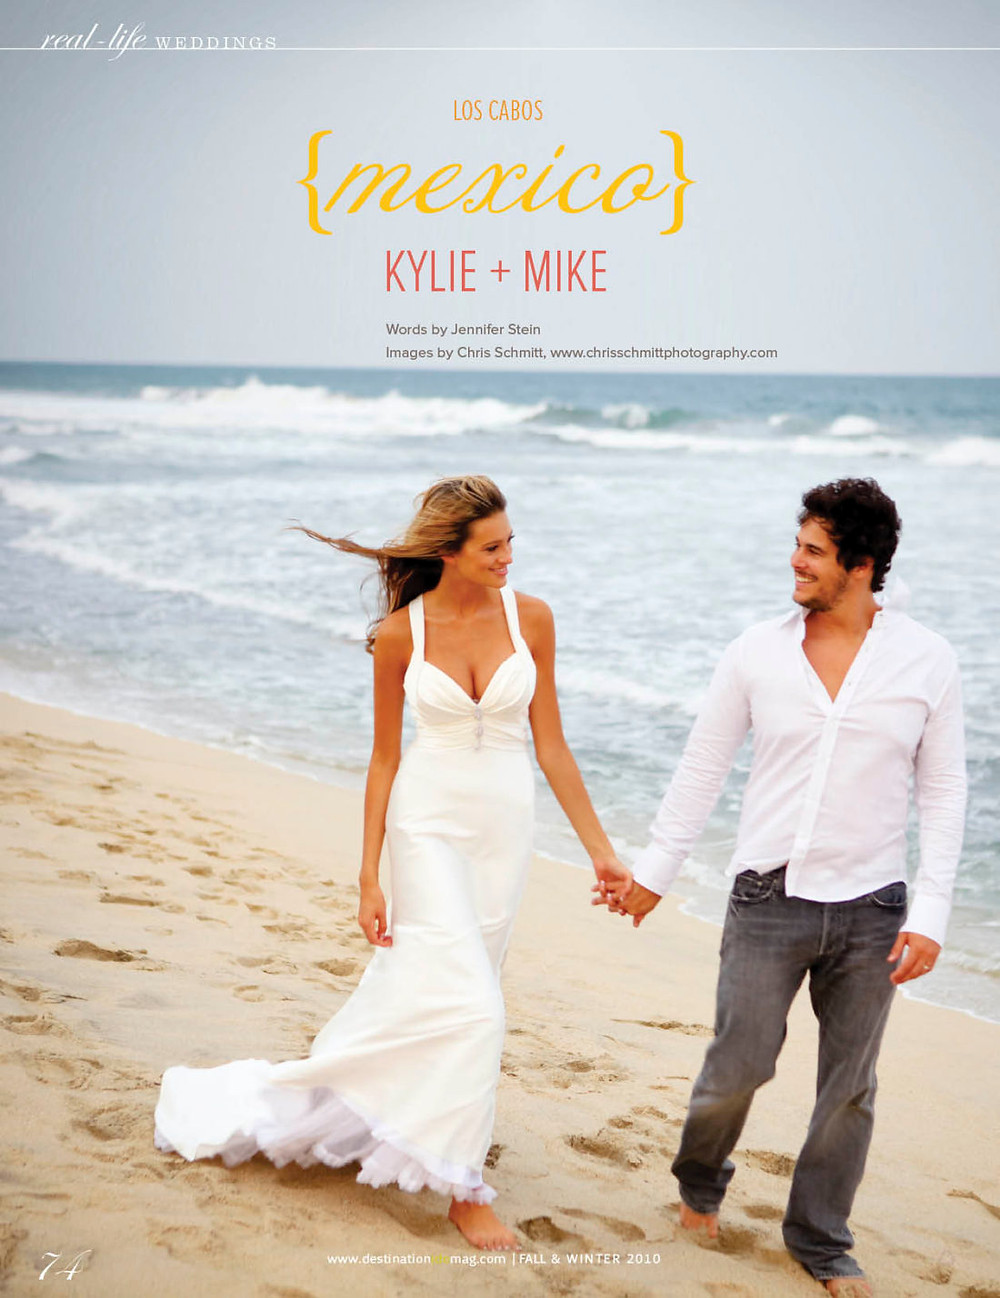 kylie-bisutti-wedding-cabo-azul